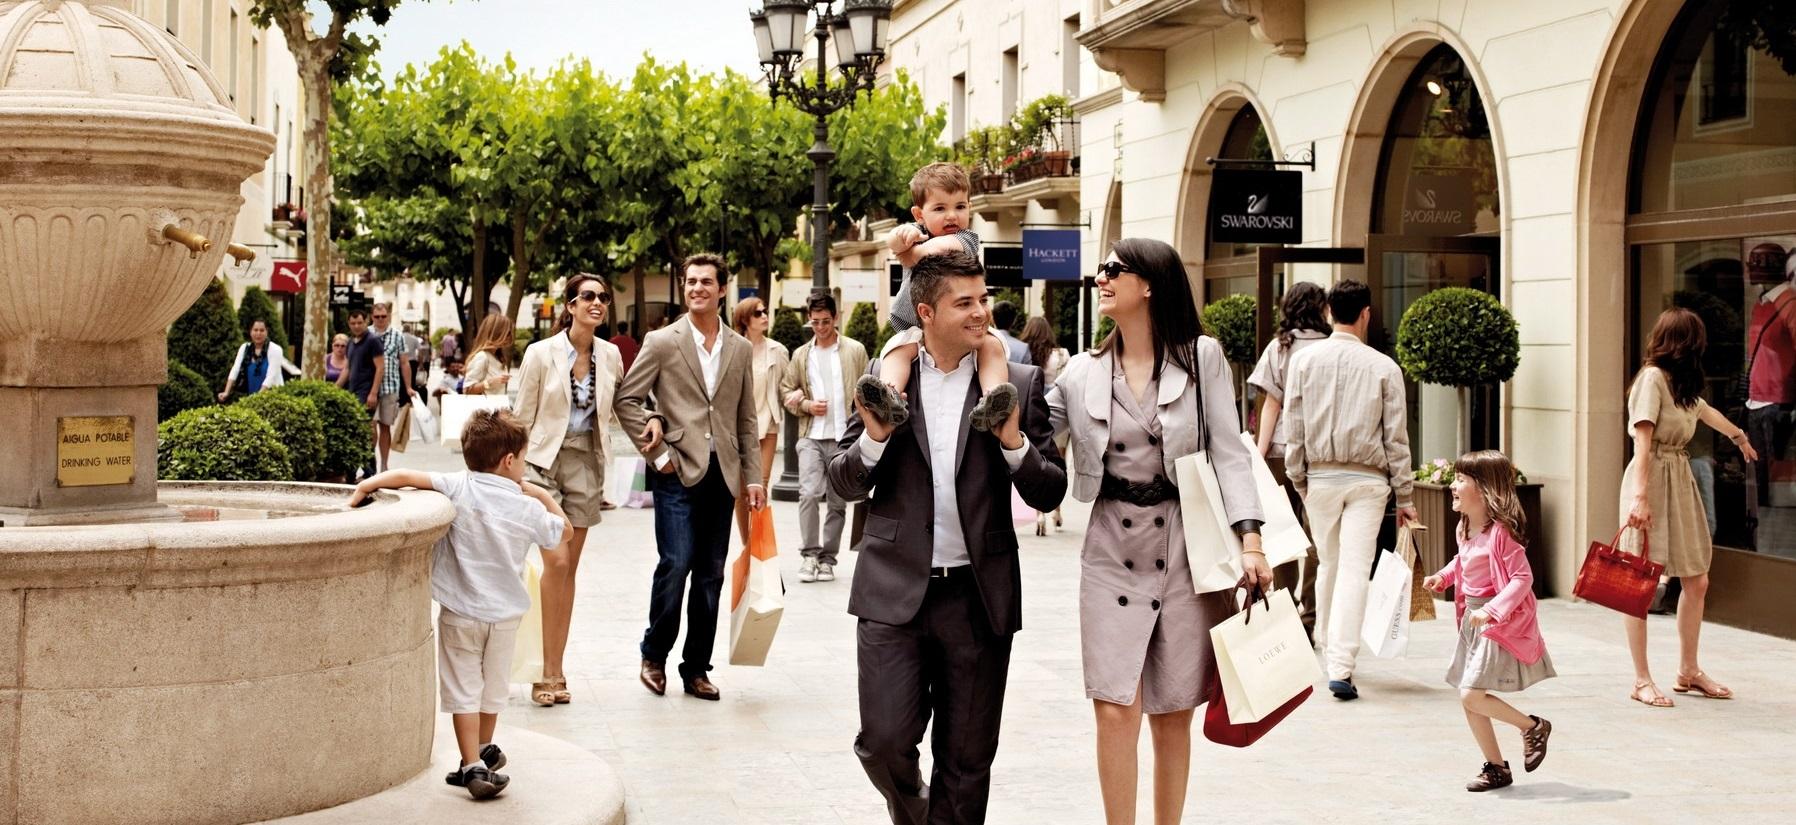 51a1ead6f37 la roca village best shopping places spots in barcelona mall malls center  top shop shops